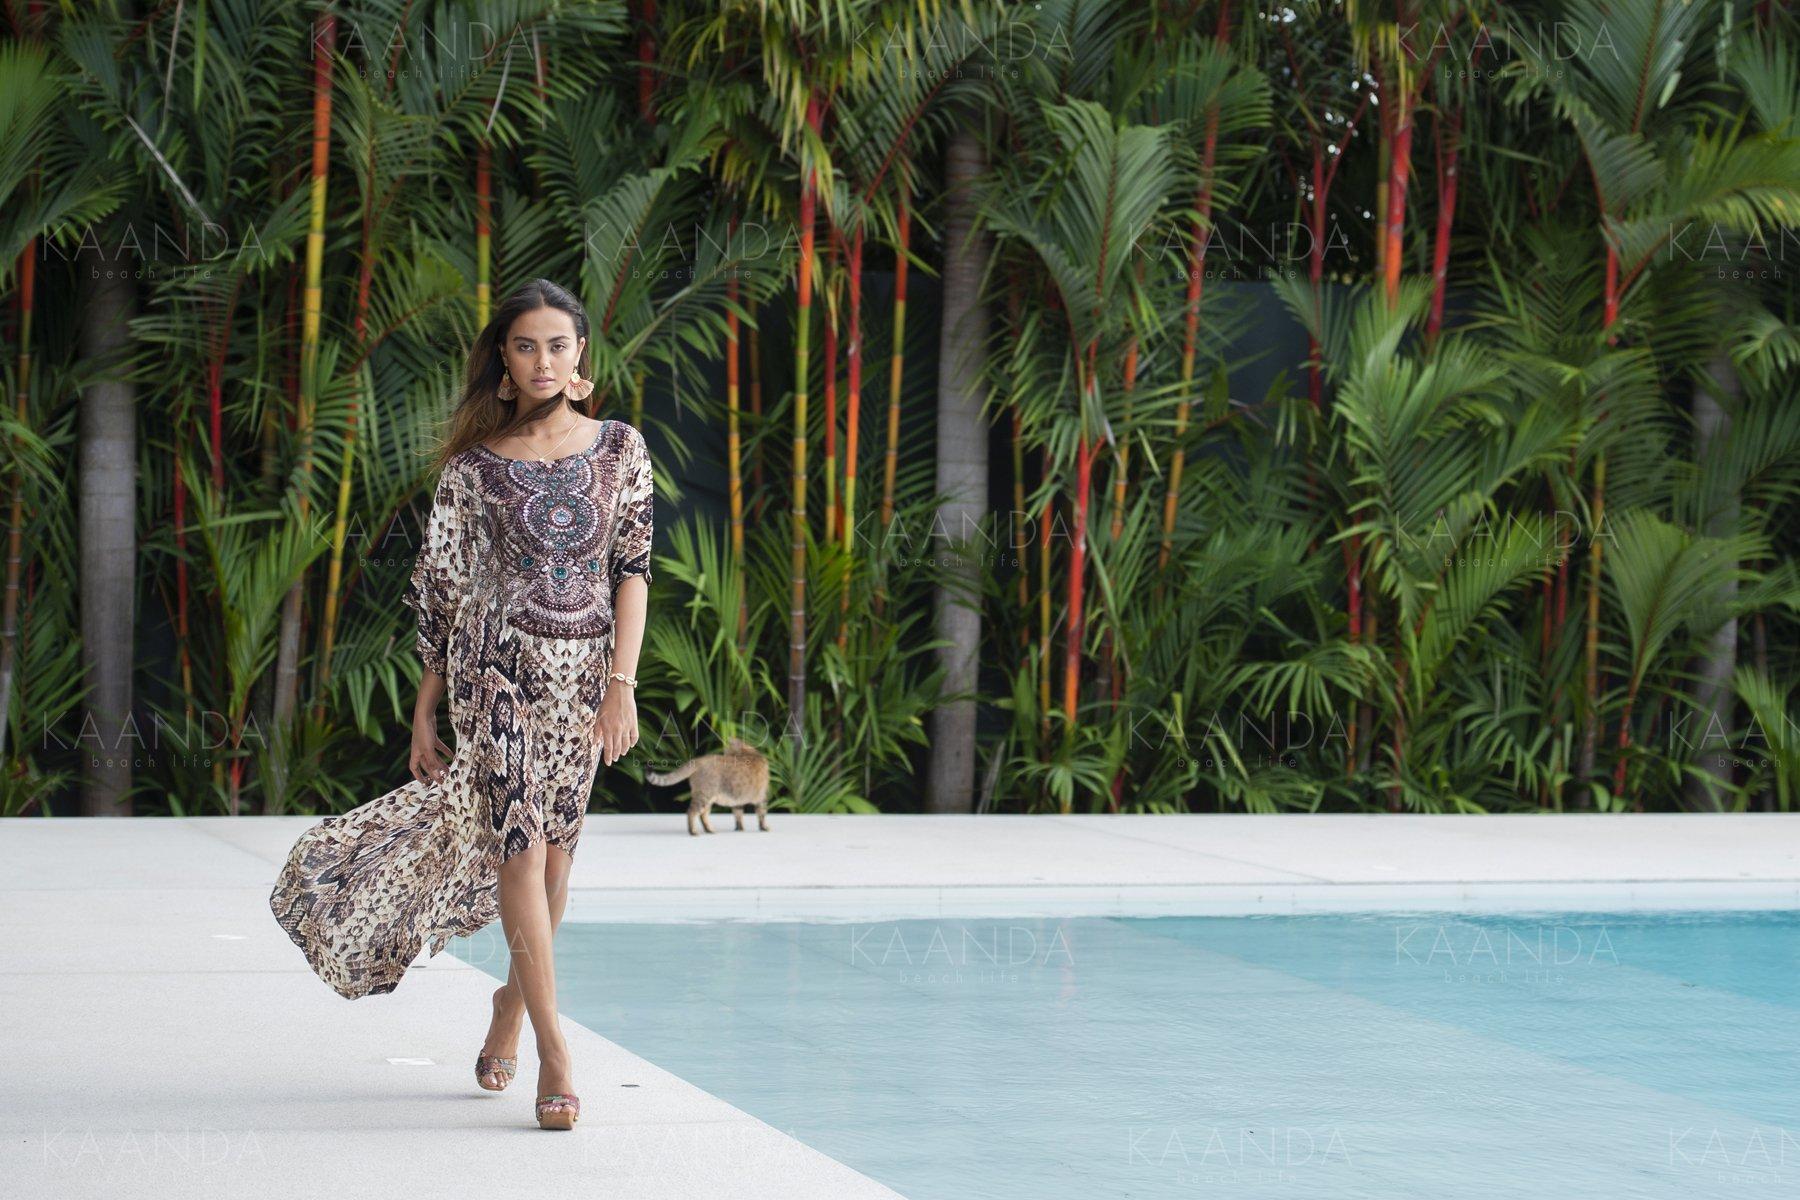 Kaftan Lång, Kaanda beach Life, Stella Snake Kimono, Resort Collection